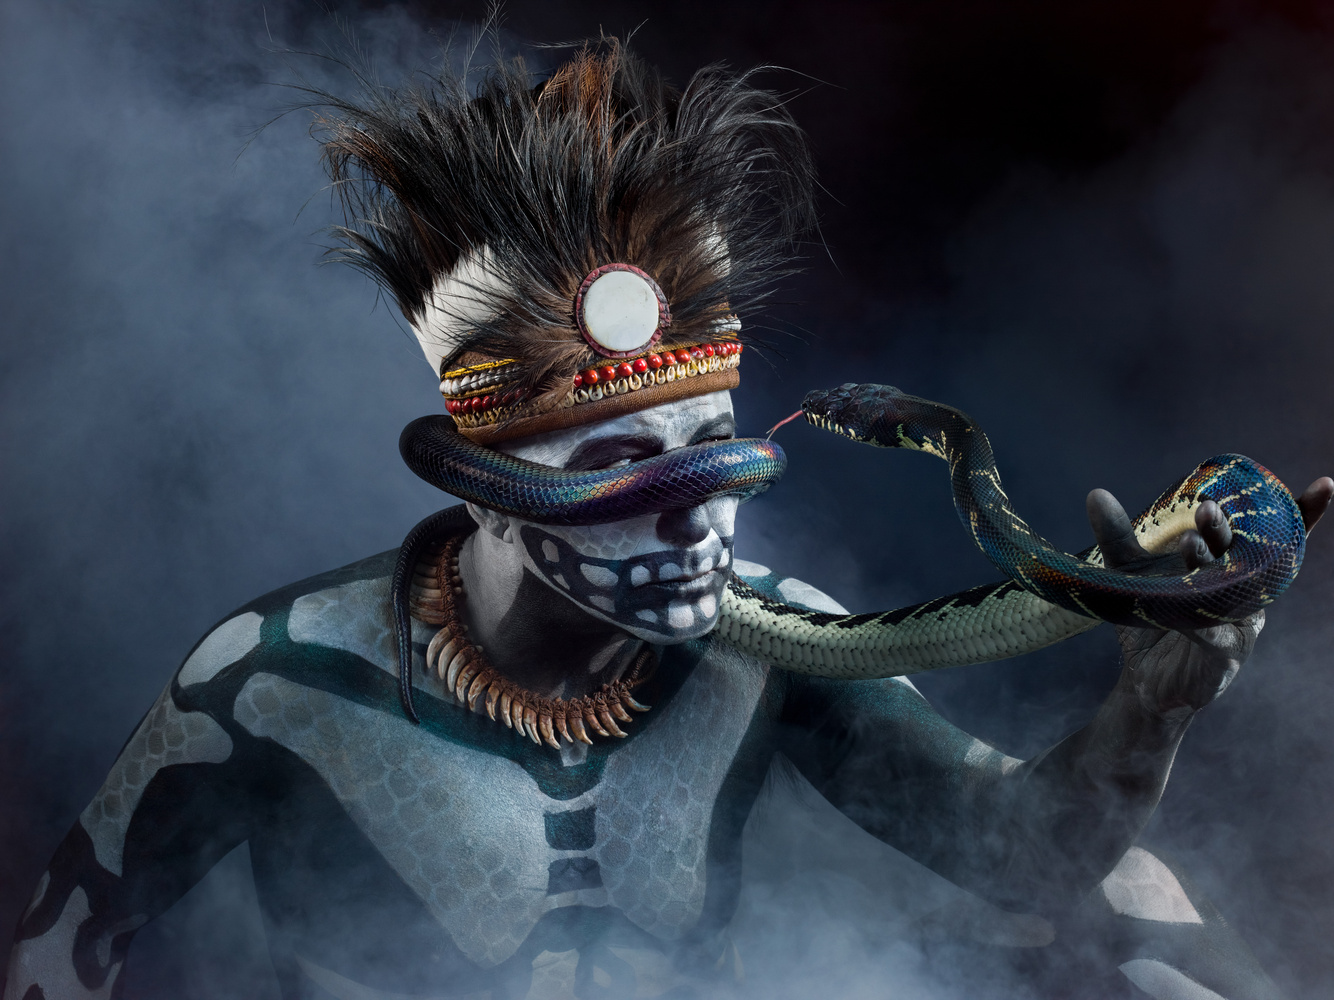 New Guinea Snake Charmer by Juan Osorio